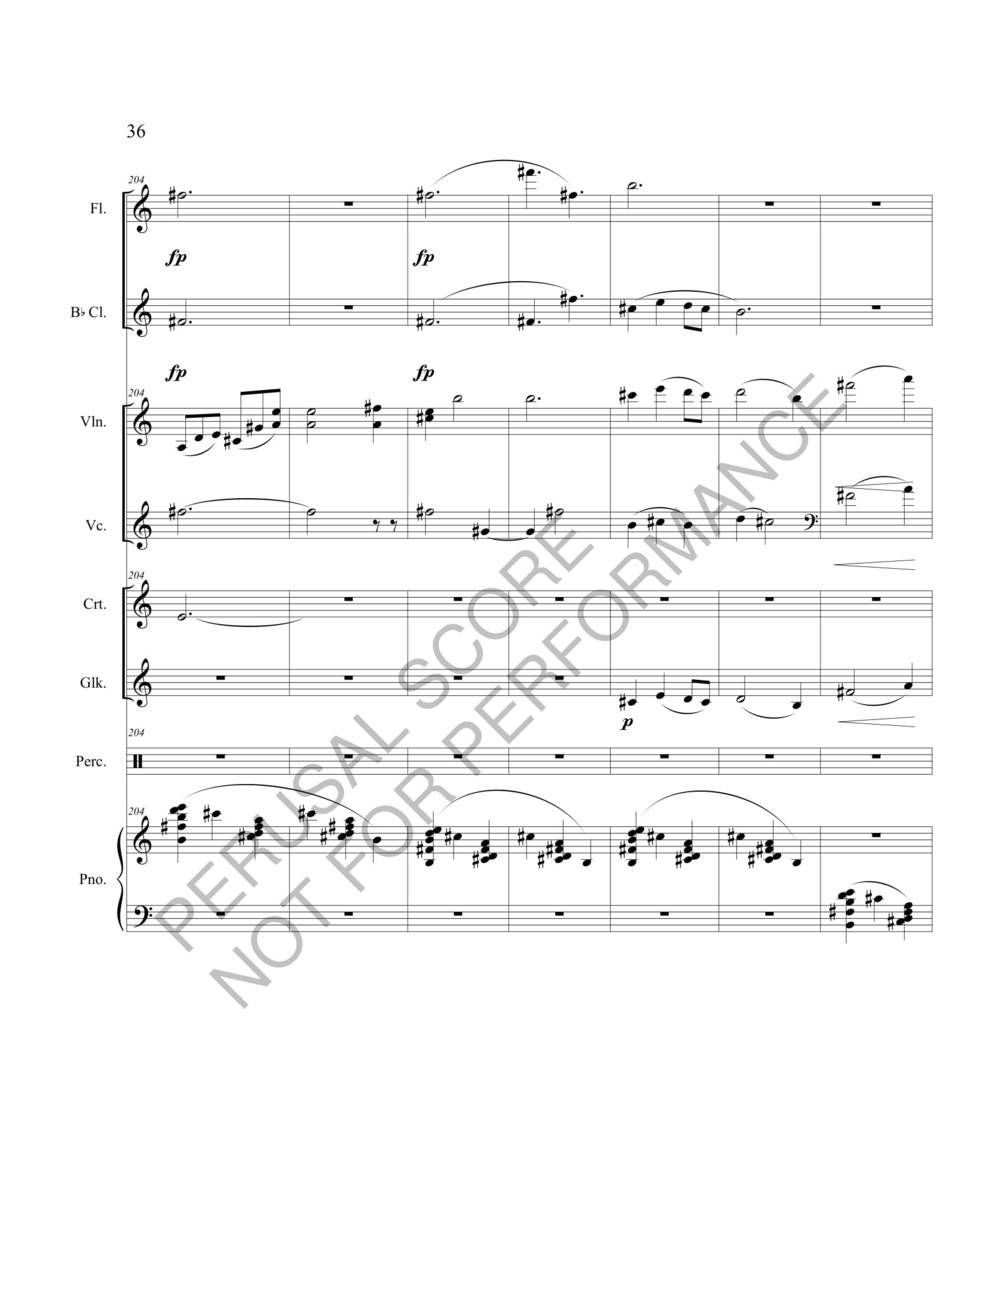 Boyd Terra Liberi Score-watermark-42.jpg